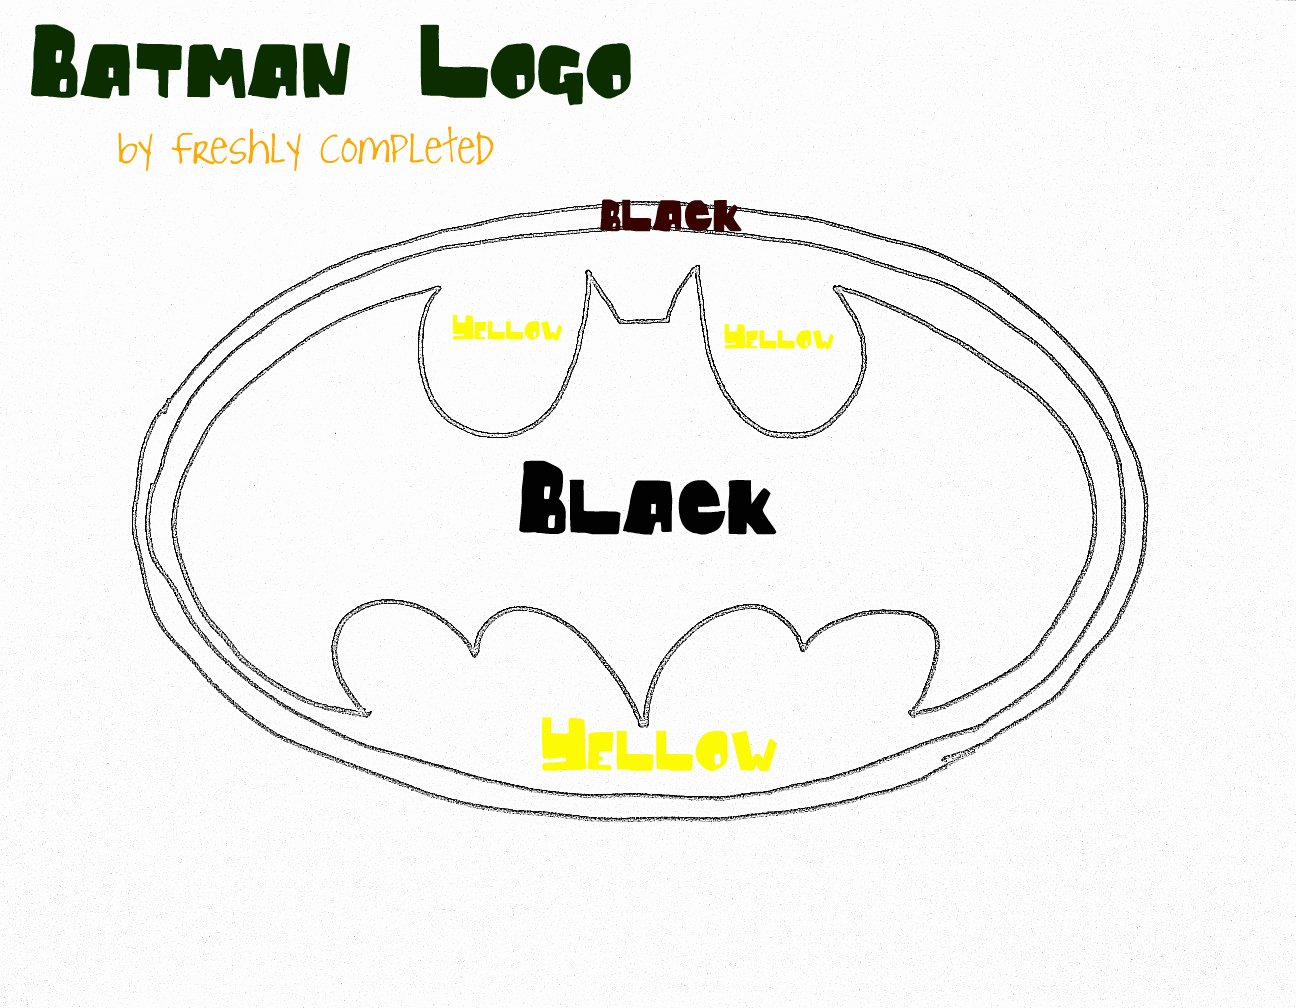 Batman Cake Template Unique Batman Template Printable Cake Ideas and Designs